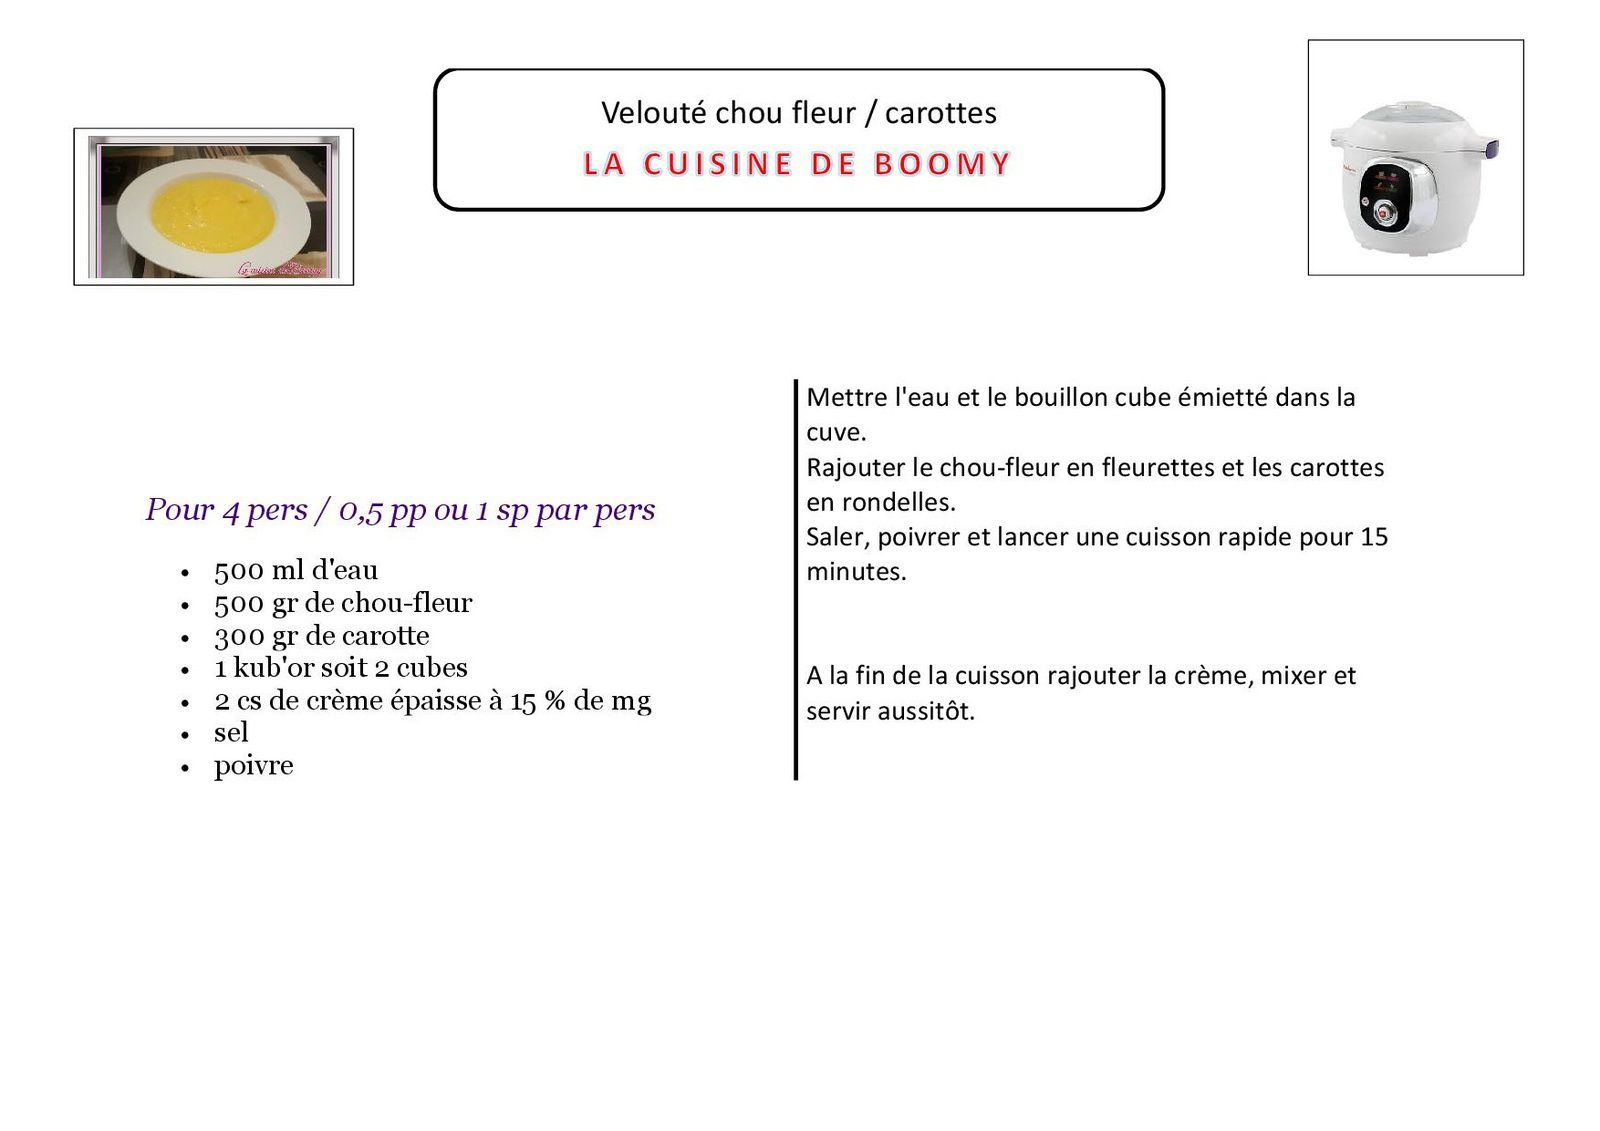 Velouté chou-fleur / carottes (Cookeo)